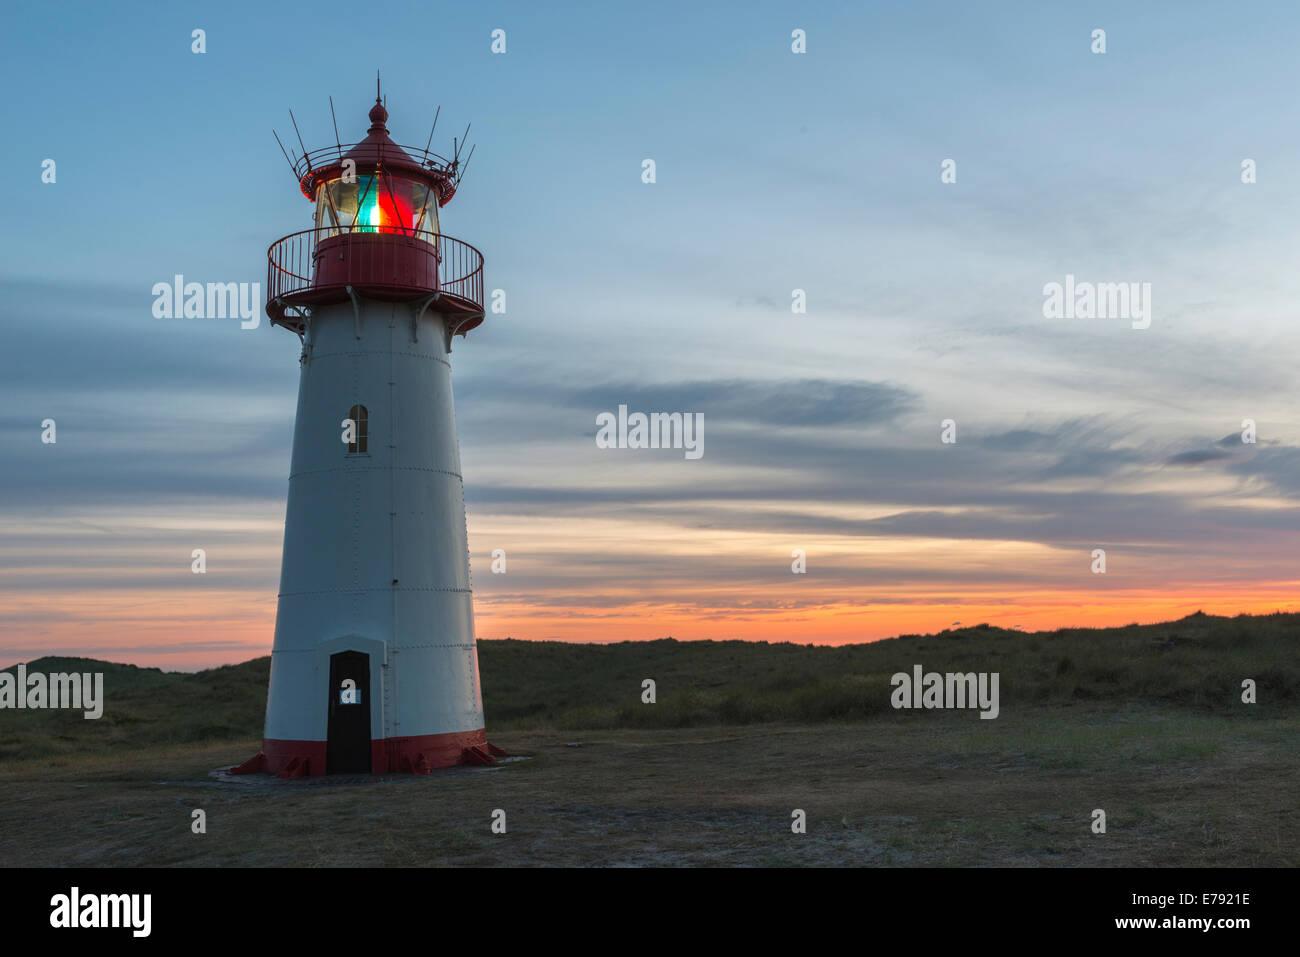 Lighthouse On The Island Sylt Germany Stock Photo 73343242 Alamy